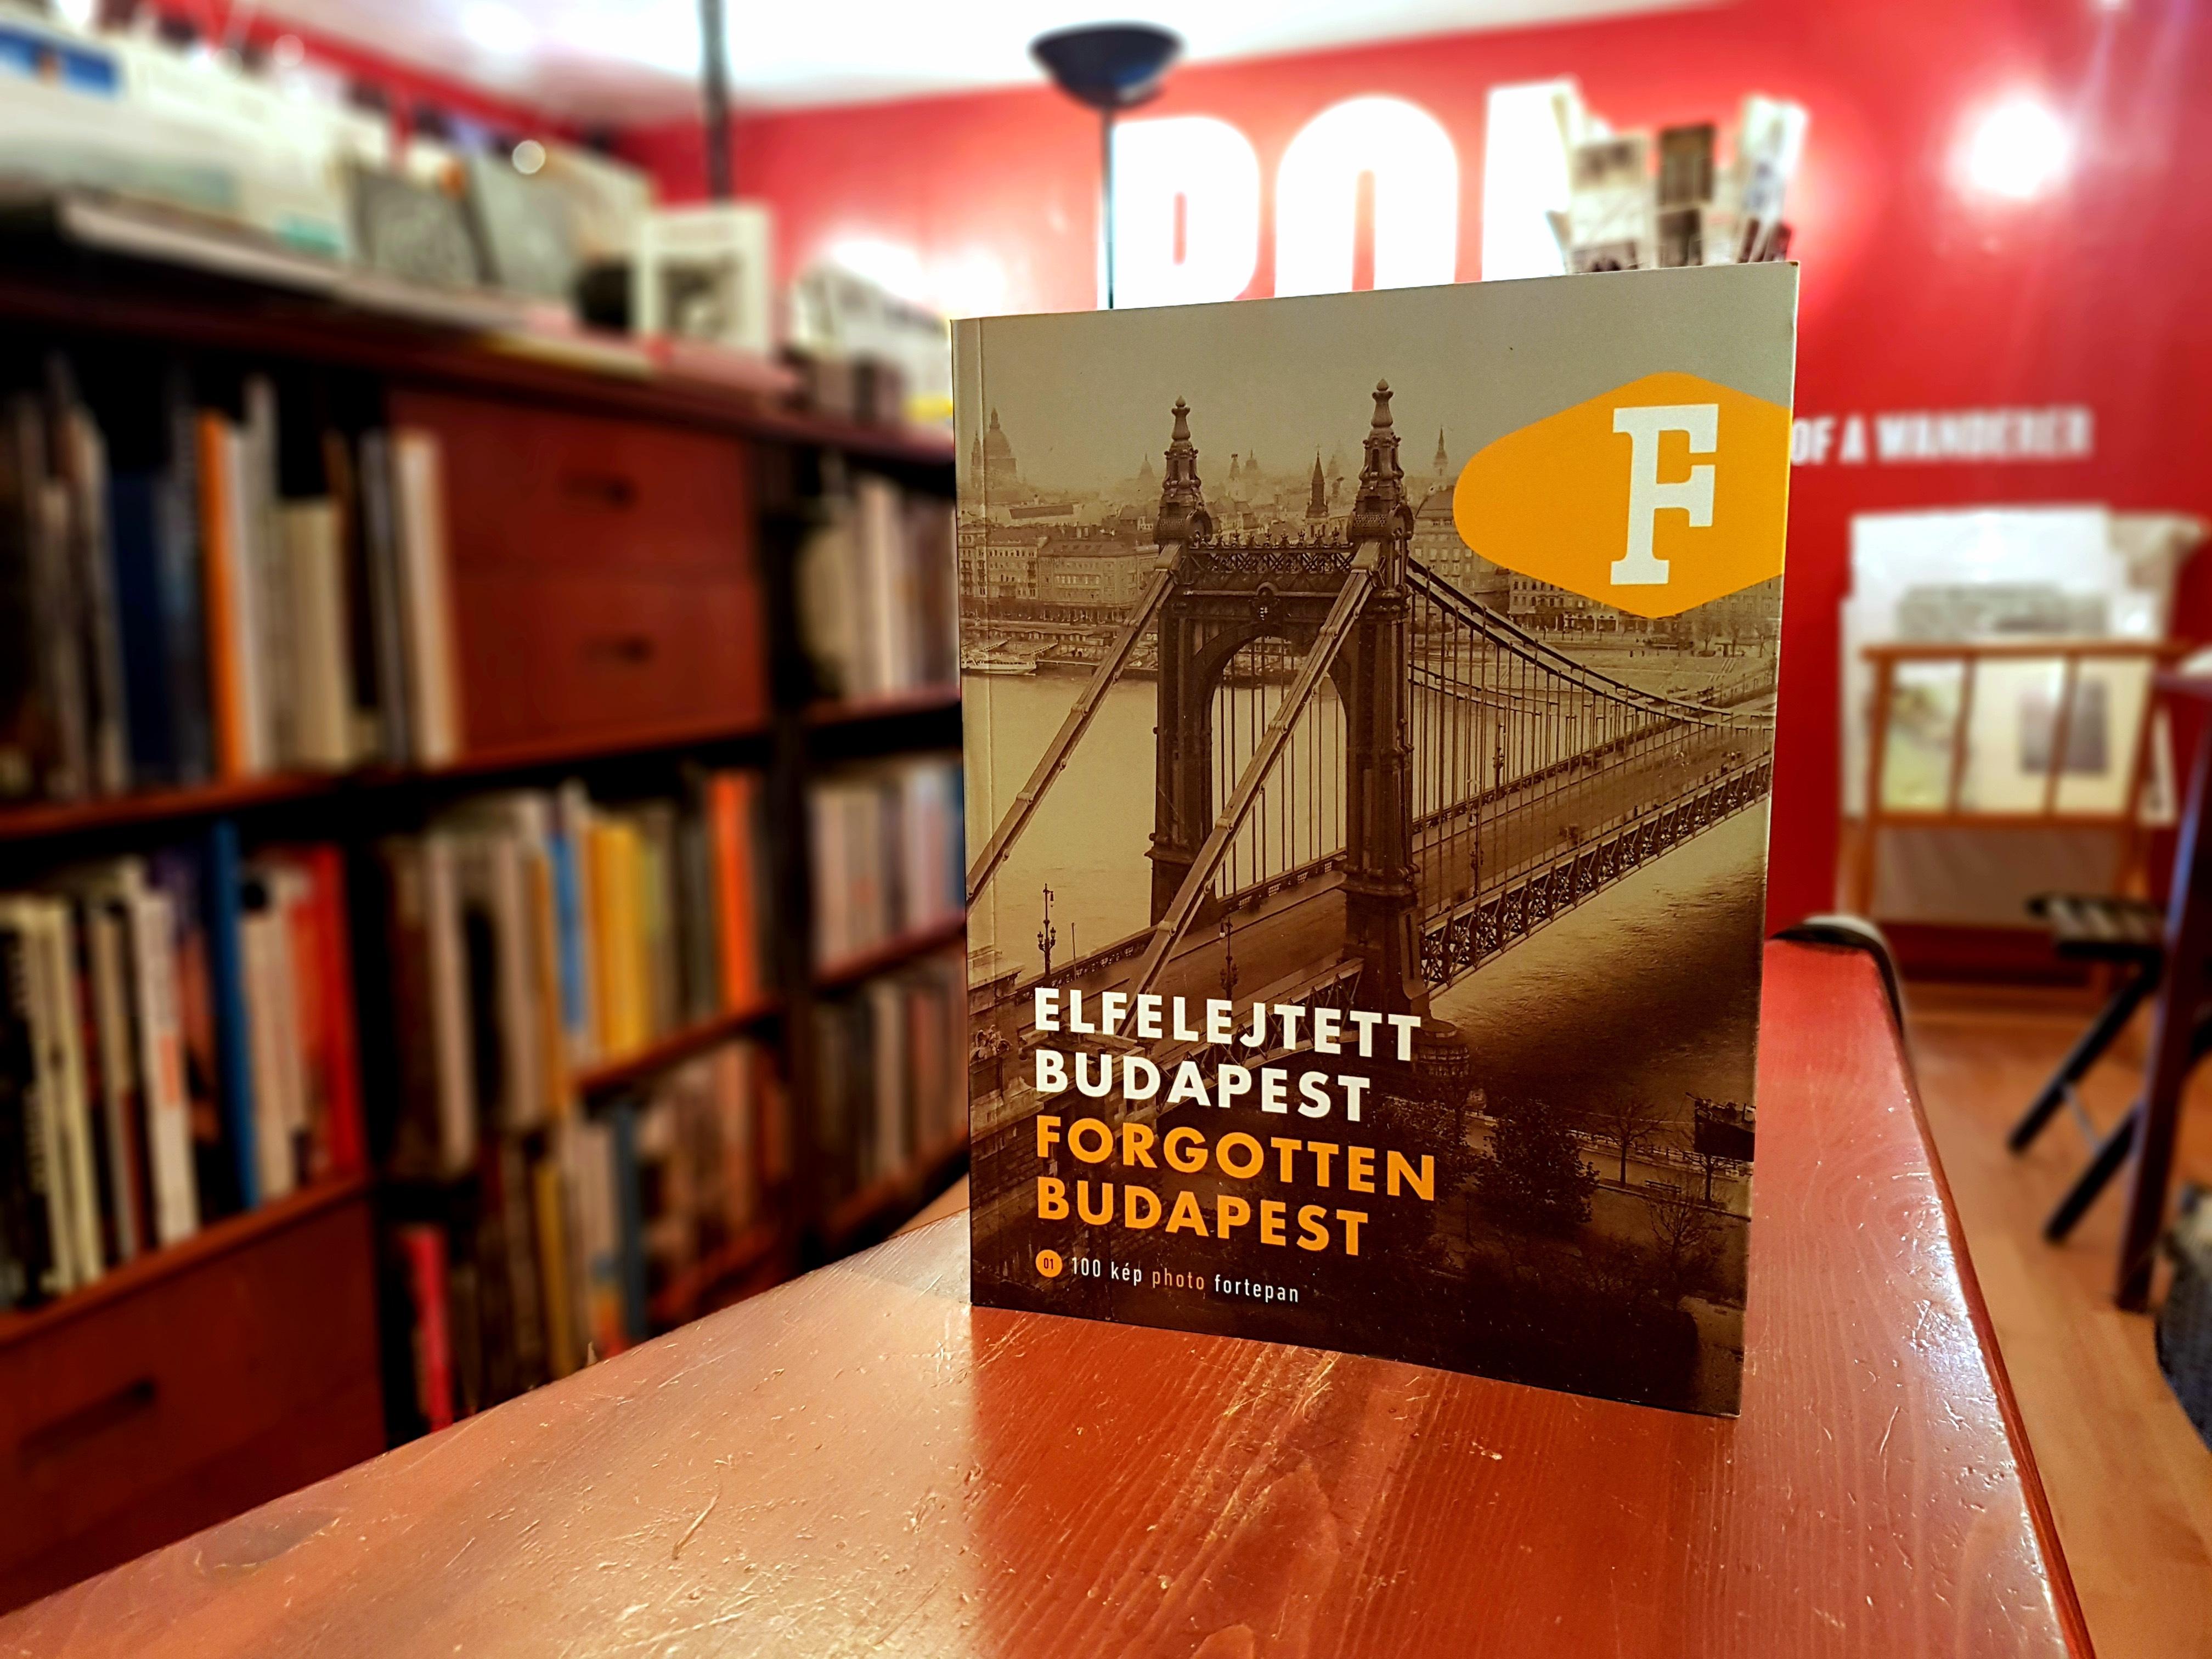 Elfelejtett Budapest. 100 fortepan fotó.